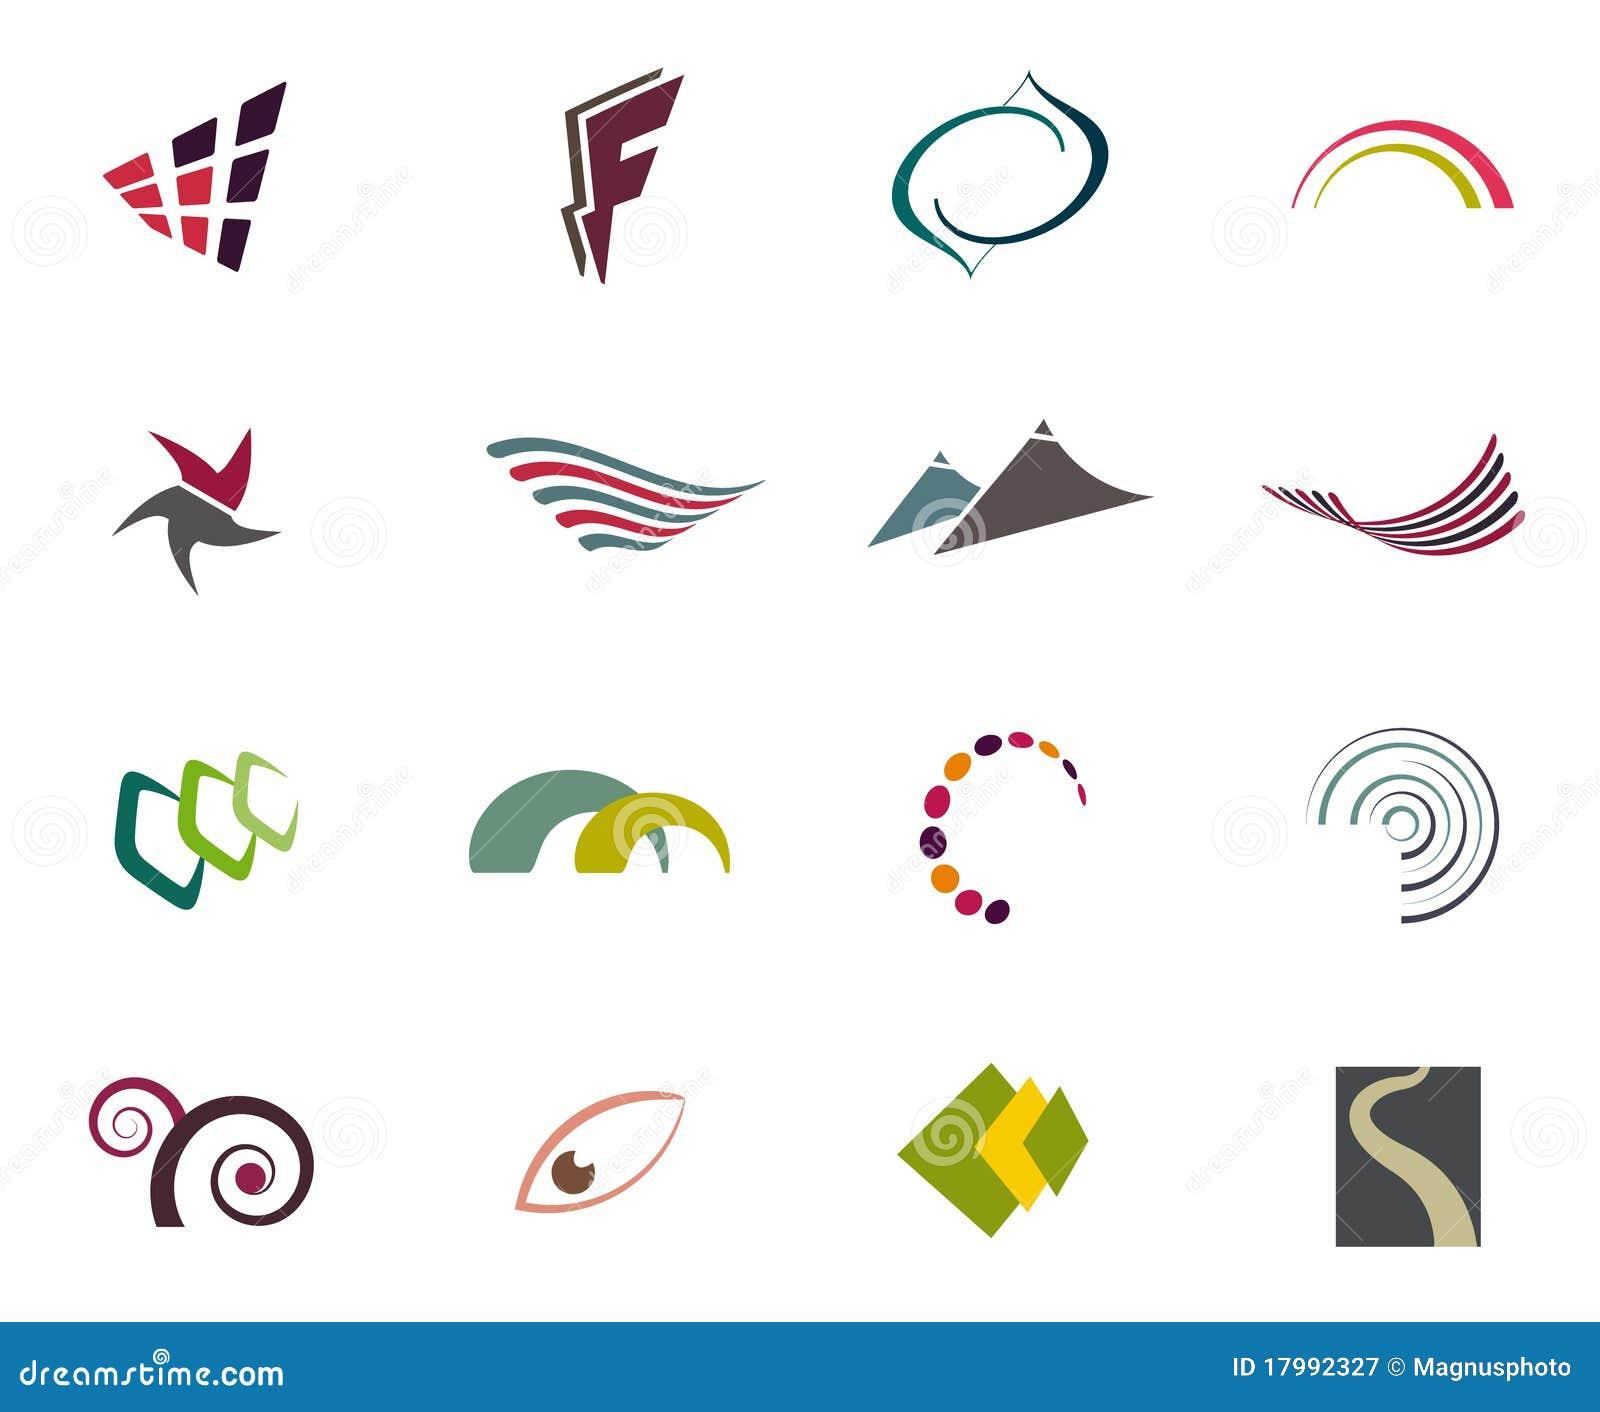 Vector logo elements royalty free stock photography Free eps editor